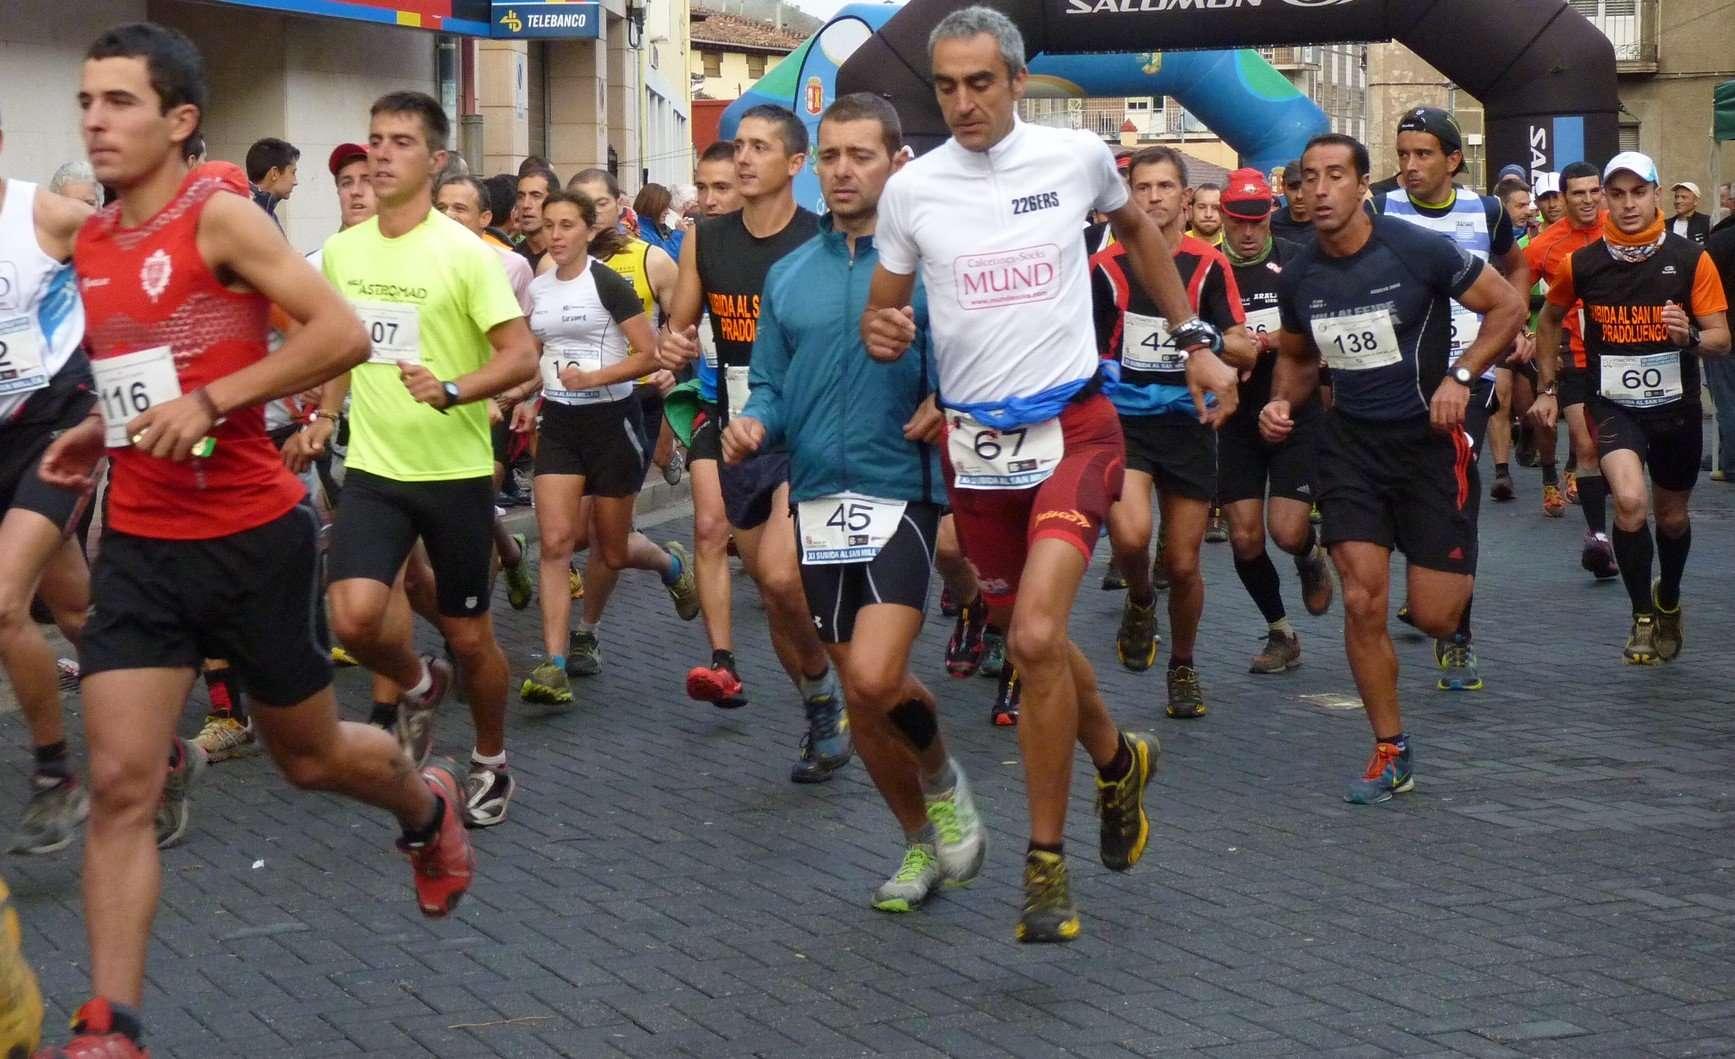 Salida de la carrera por montaña Subida al San Millán, en 2013. /Montañeros Pradoluengo